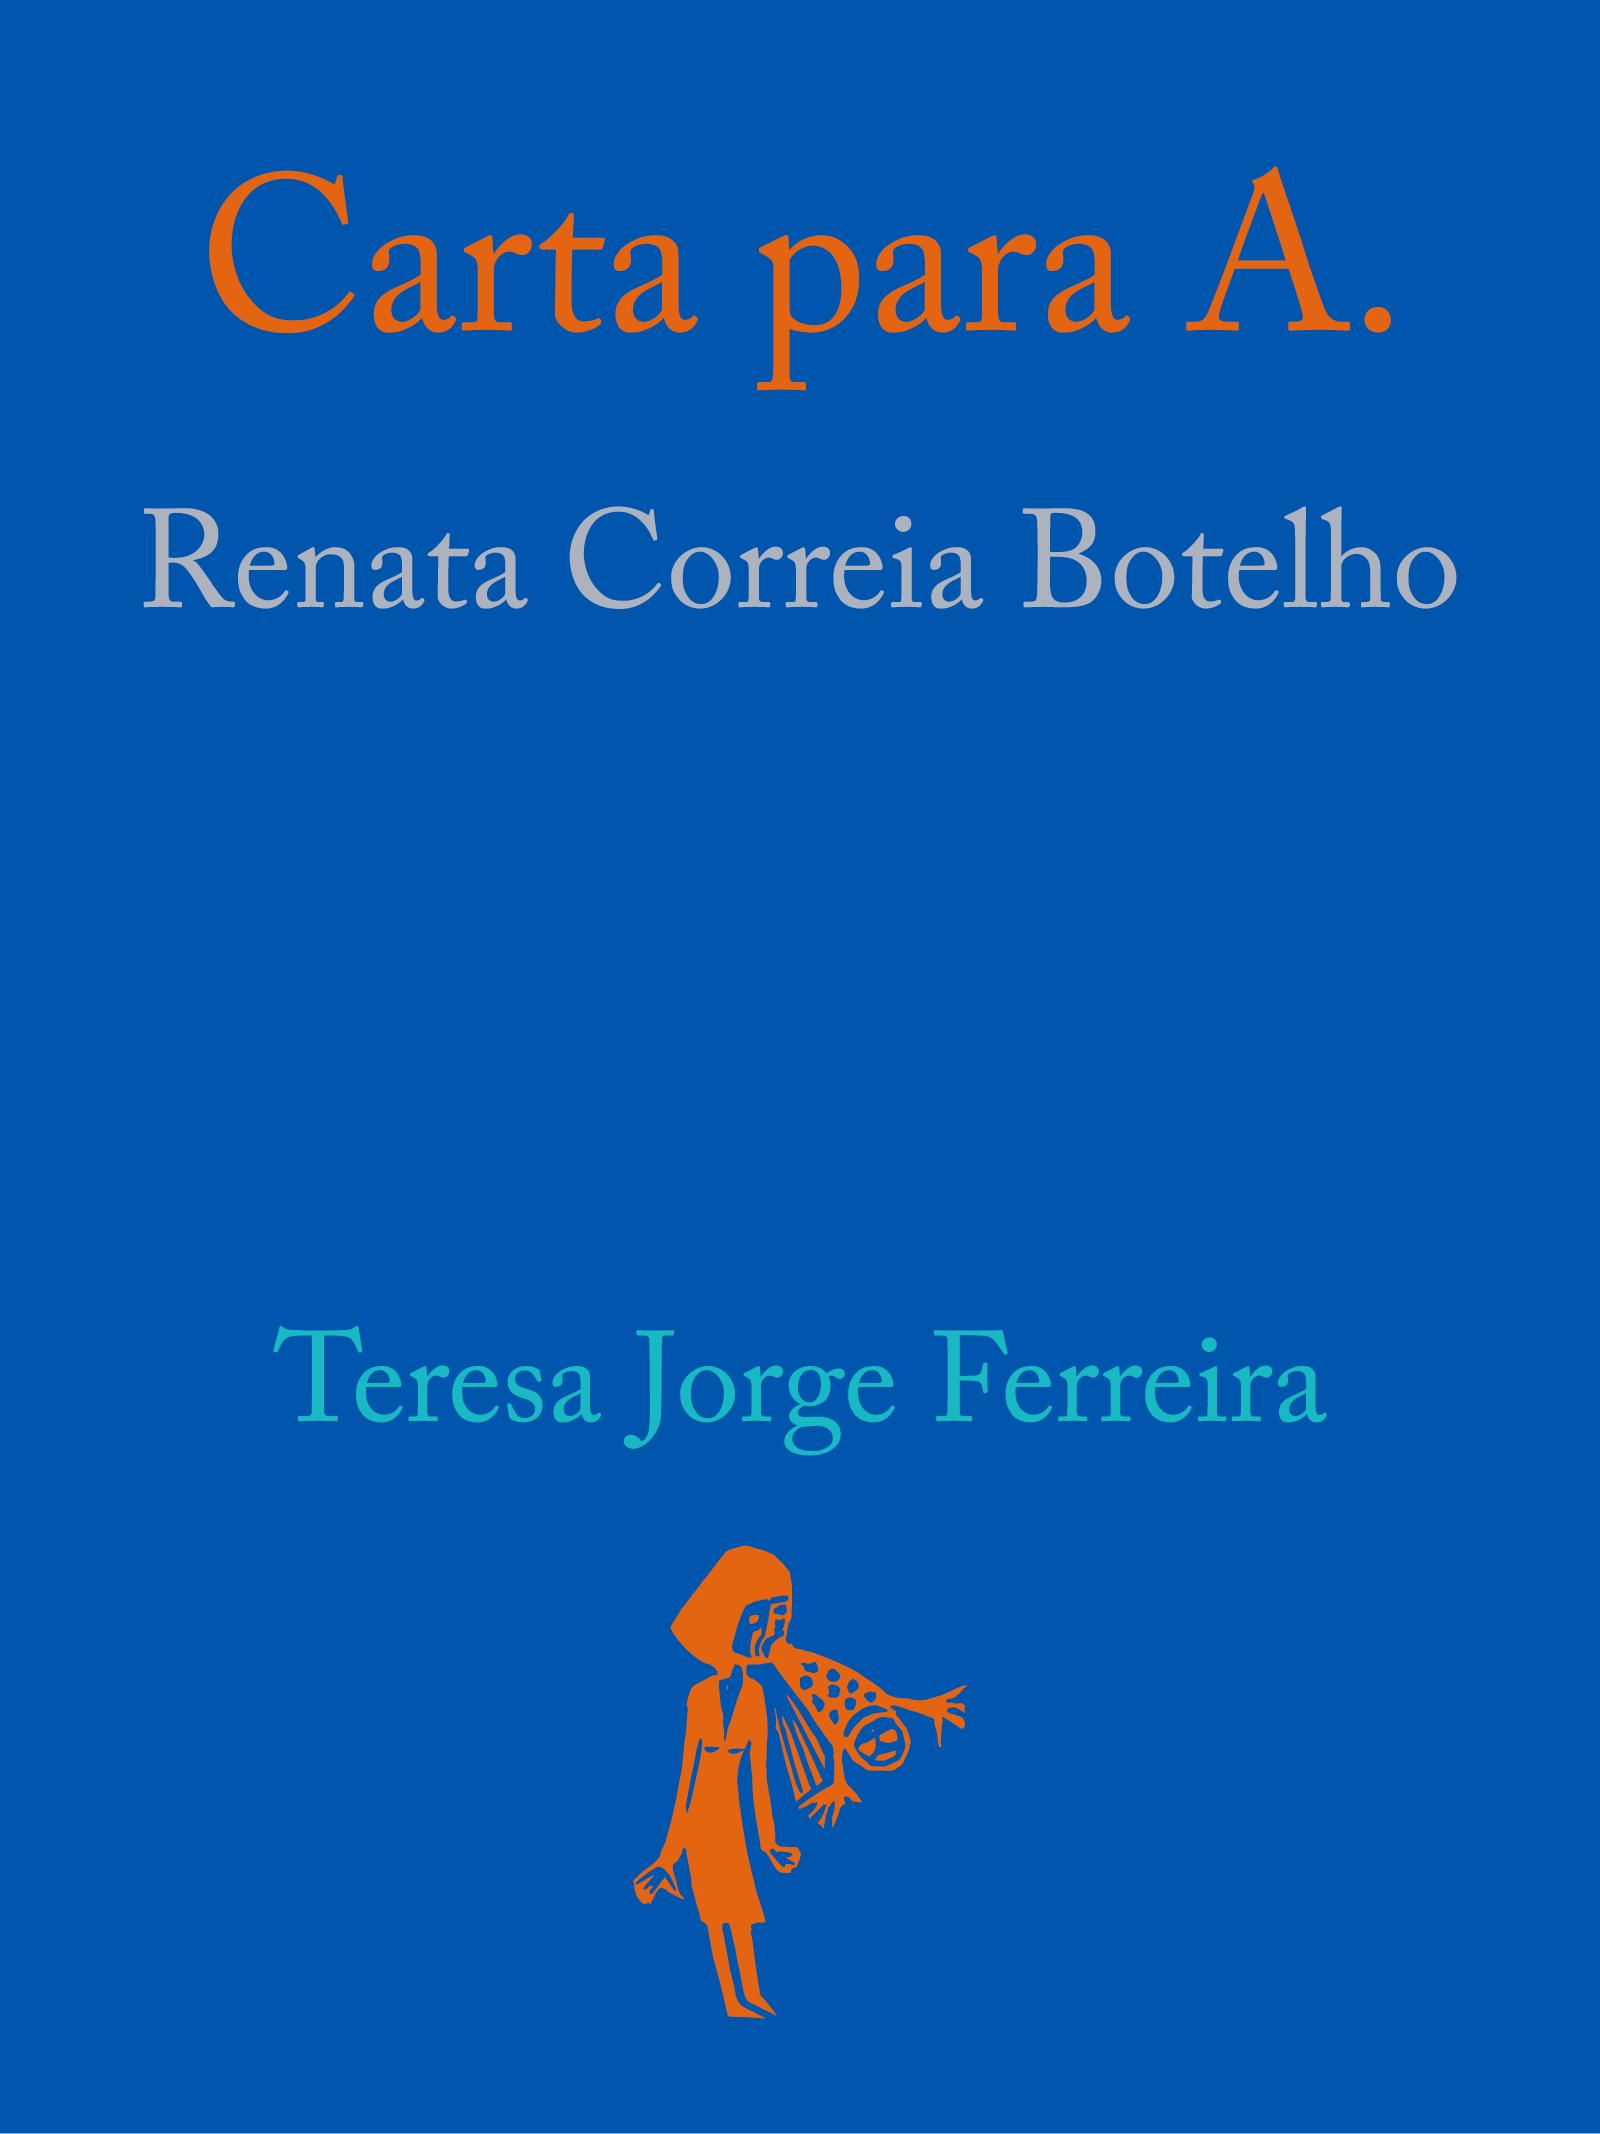 cartaTF3.png